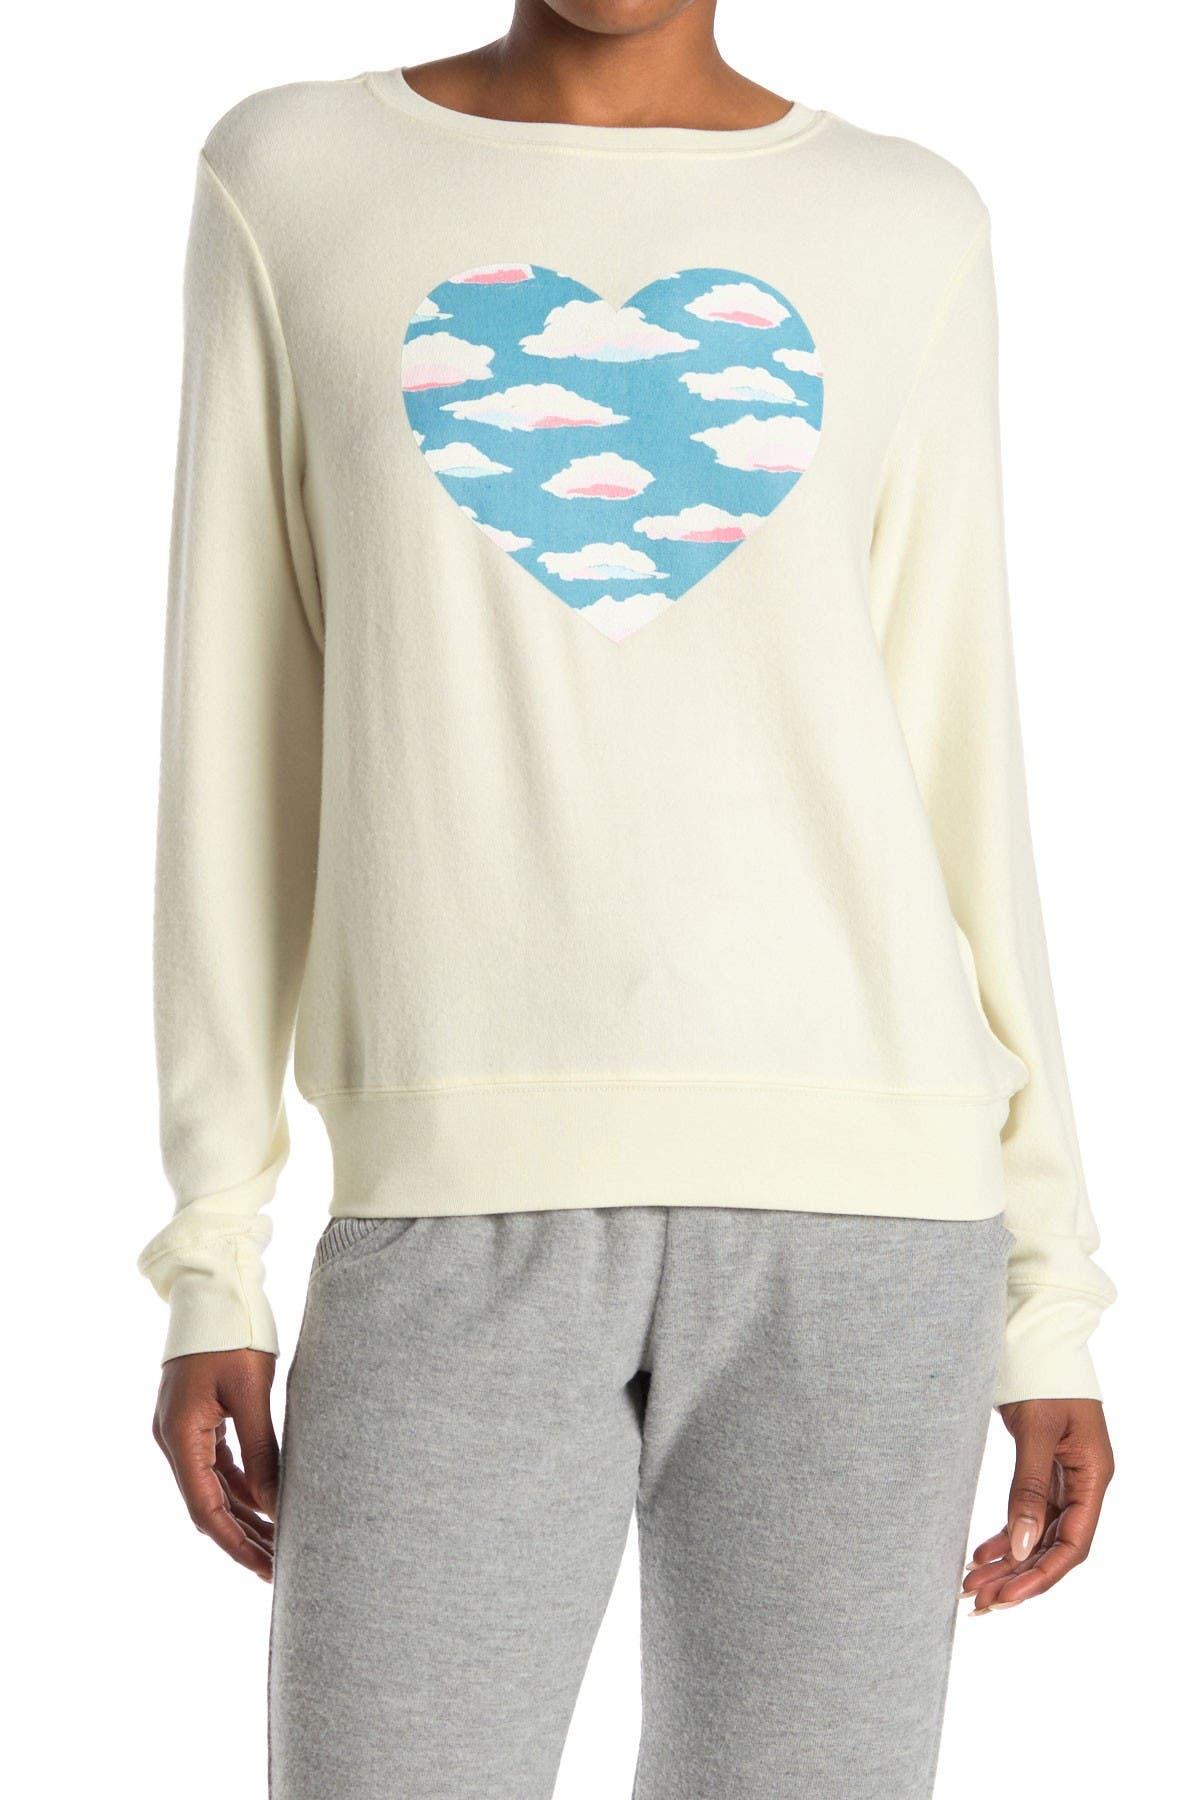 M /& L Tailles Wildfox Femme Pull-over Brain Freeze graphique blanc Sweatshirts